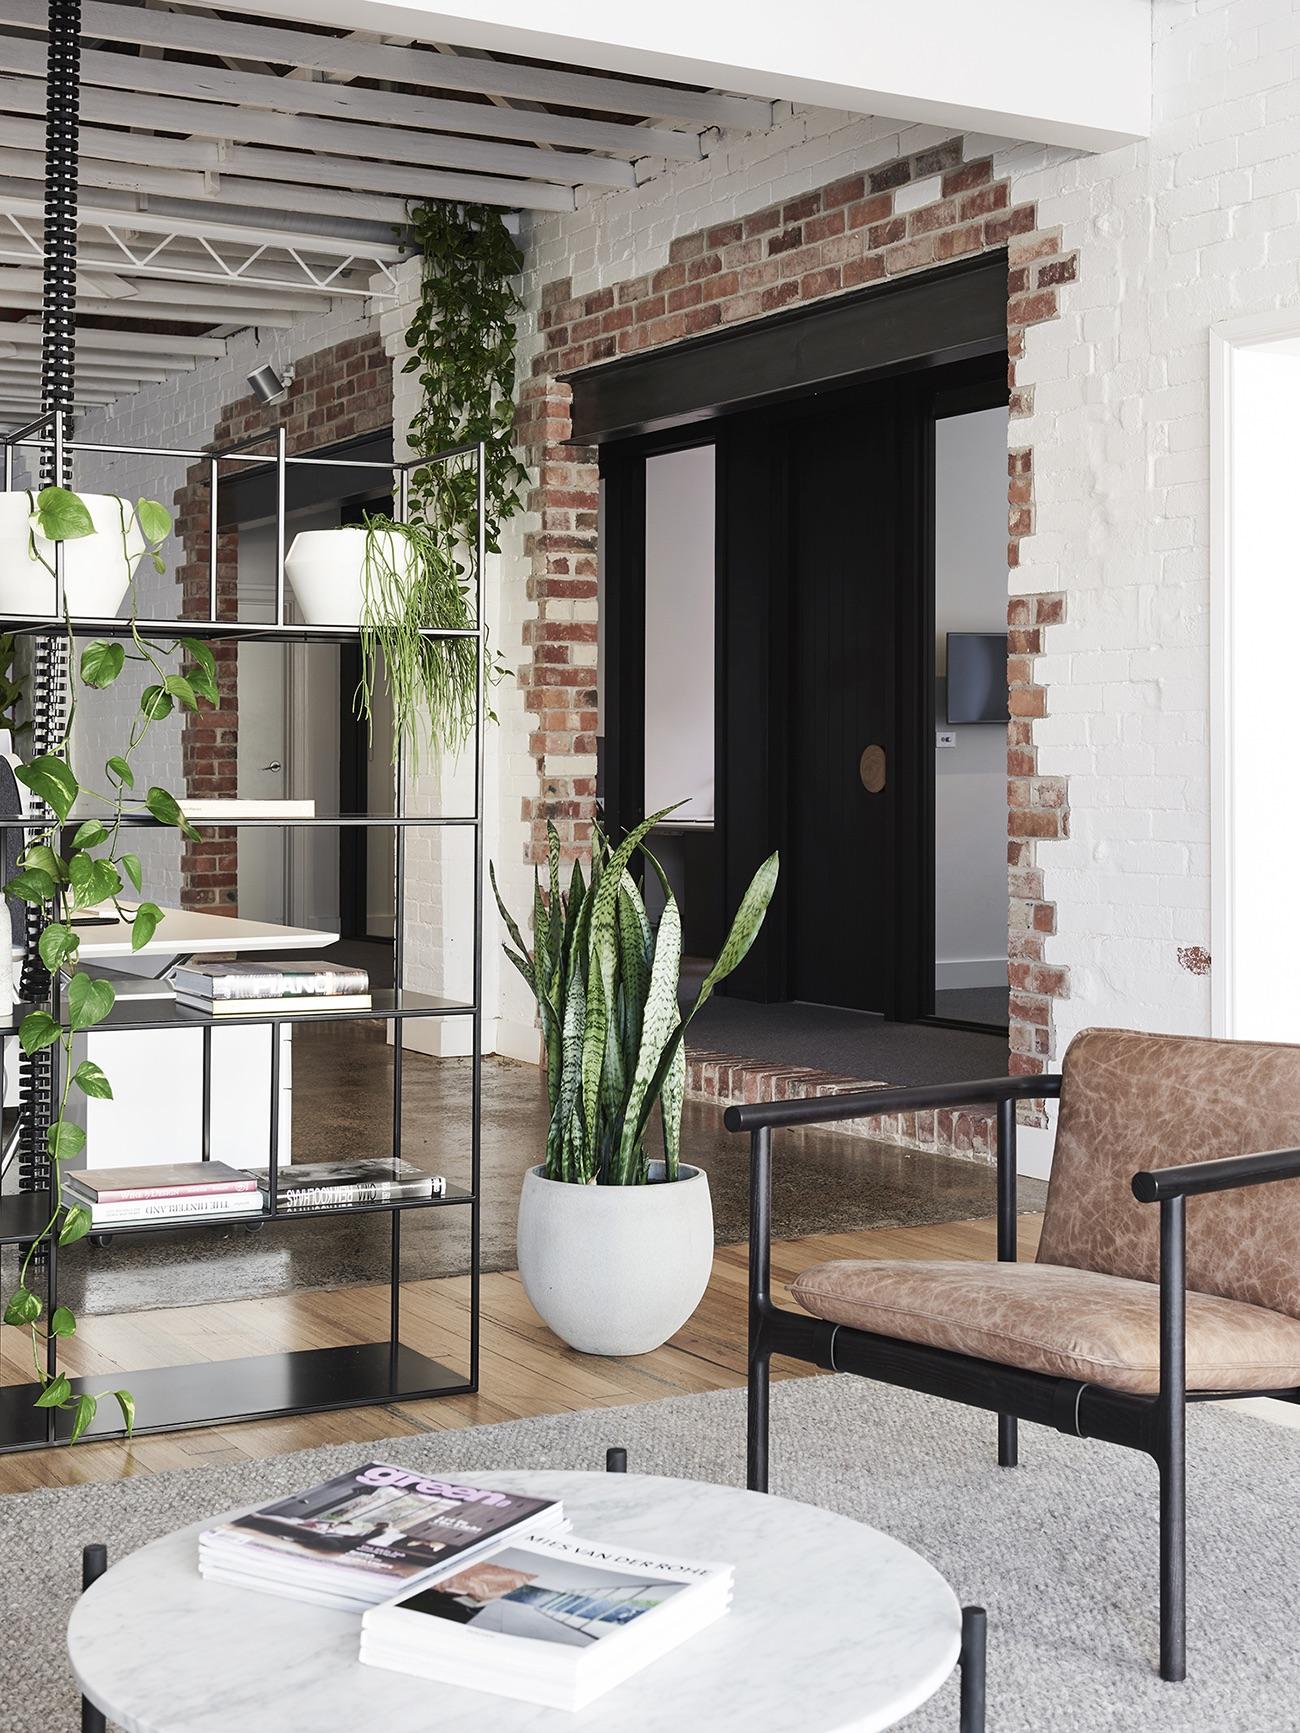 dwa-nbd-studio-office-9